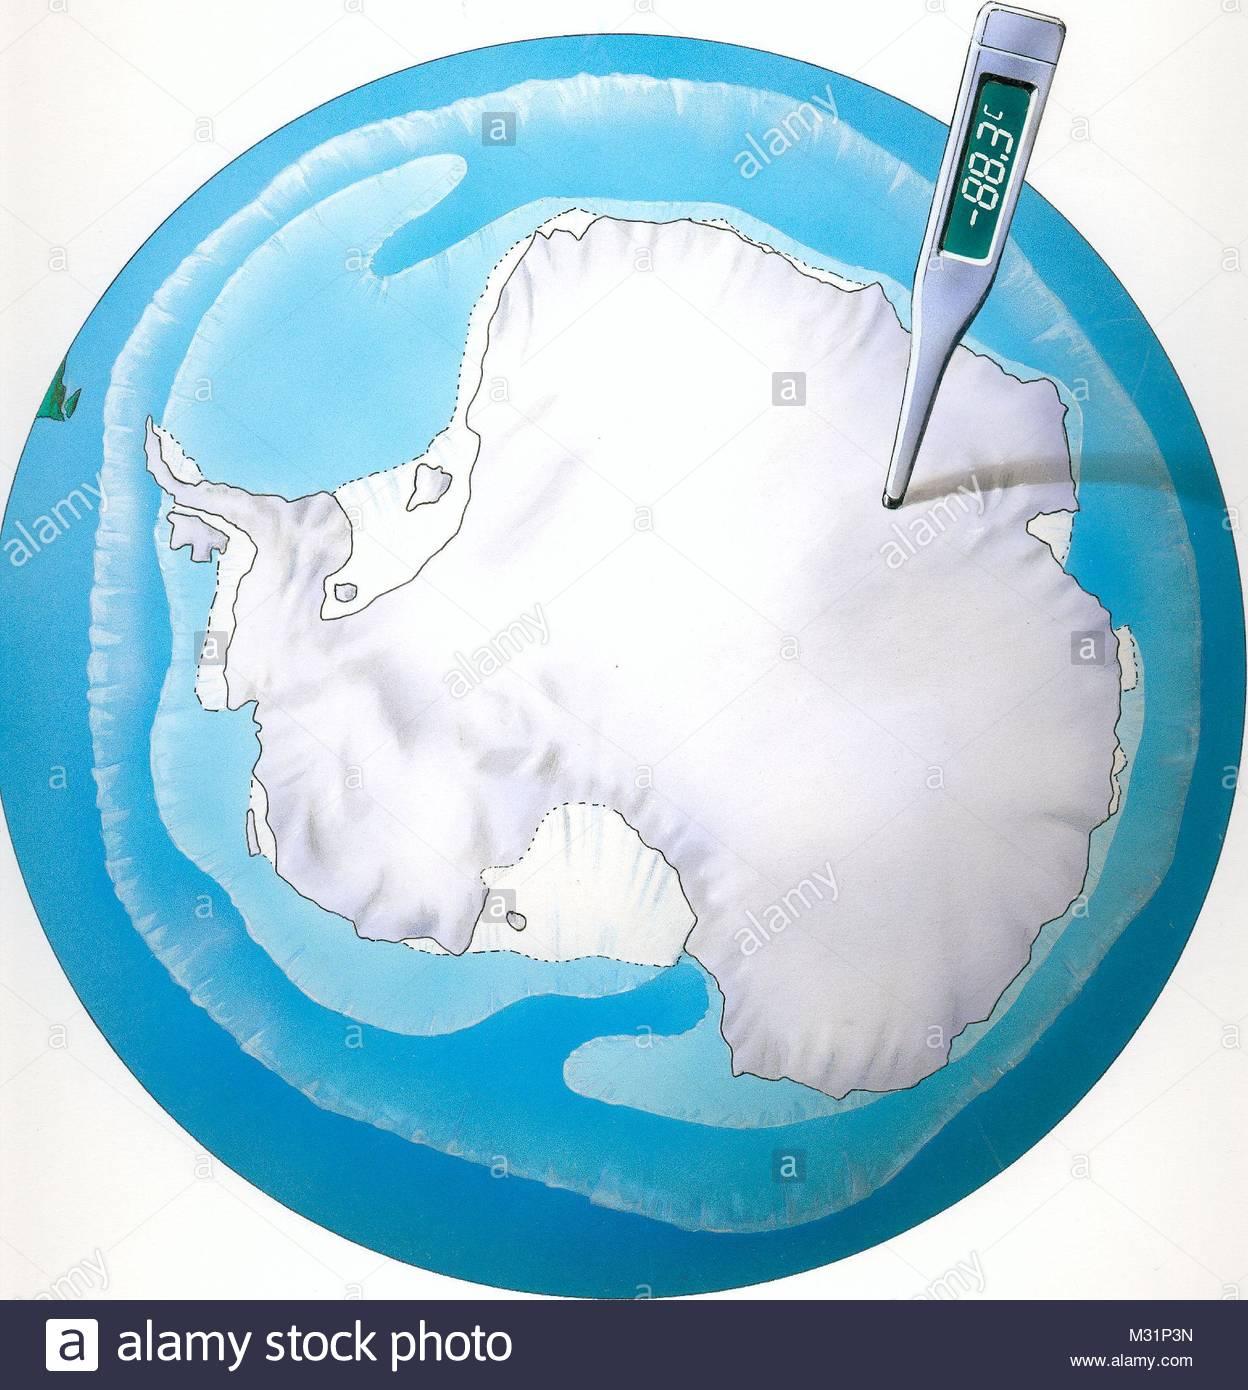 Antarctica Map Sdpol temperature measurement - Stock Image